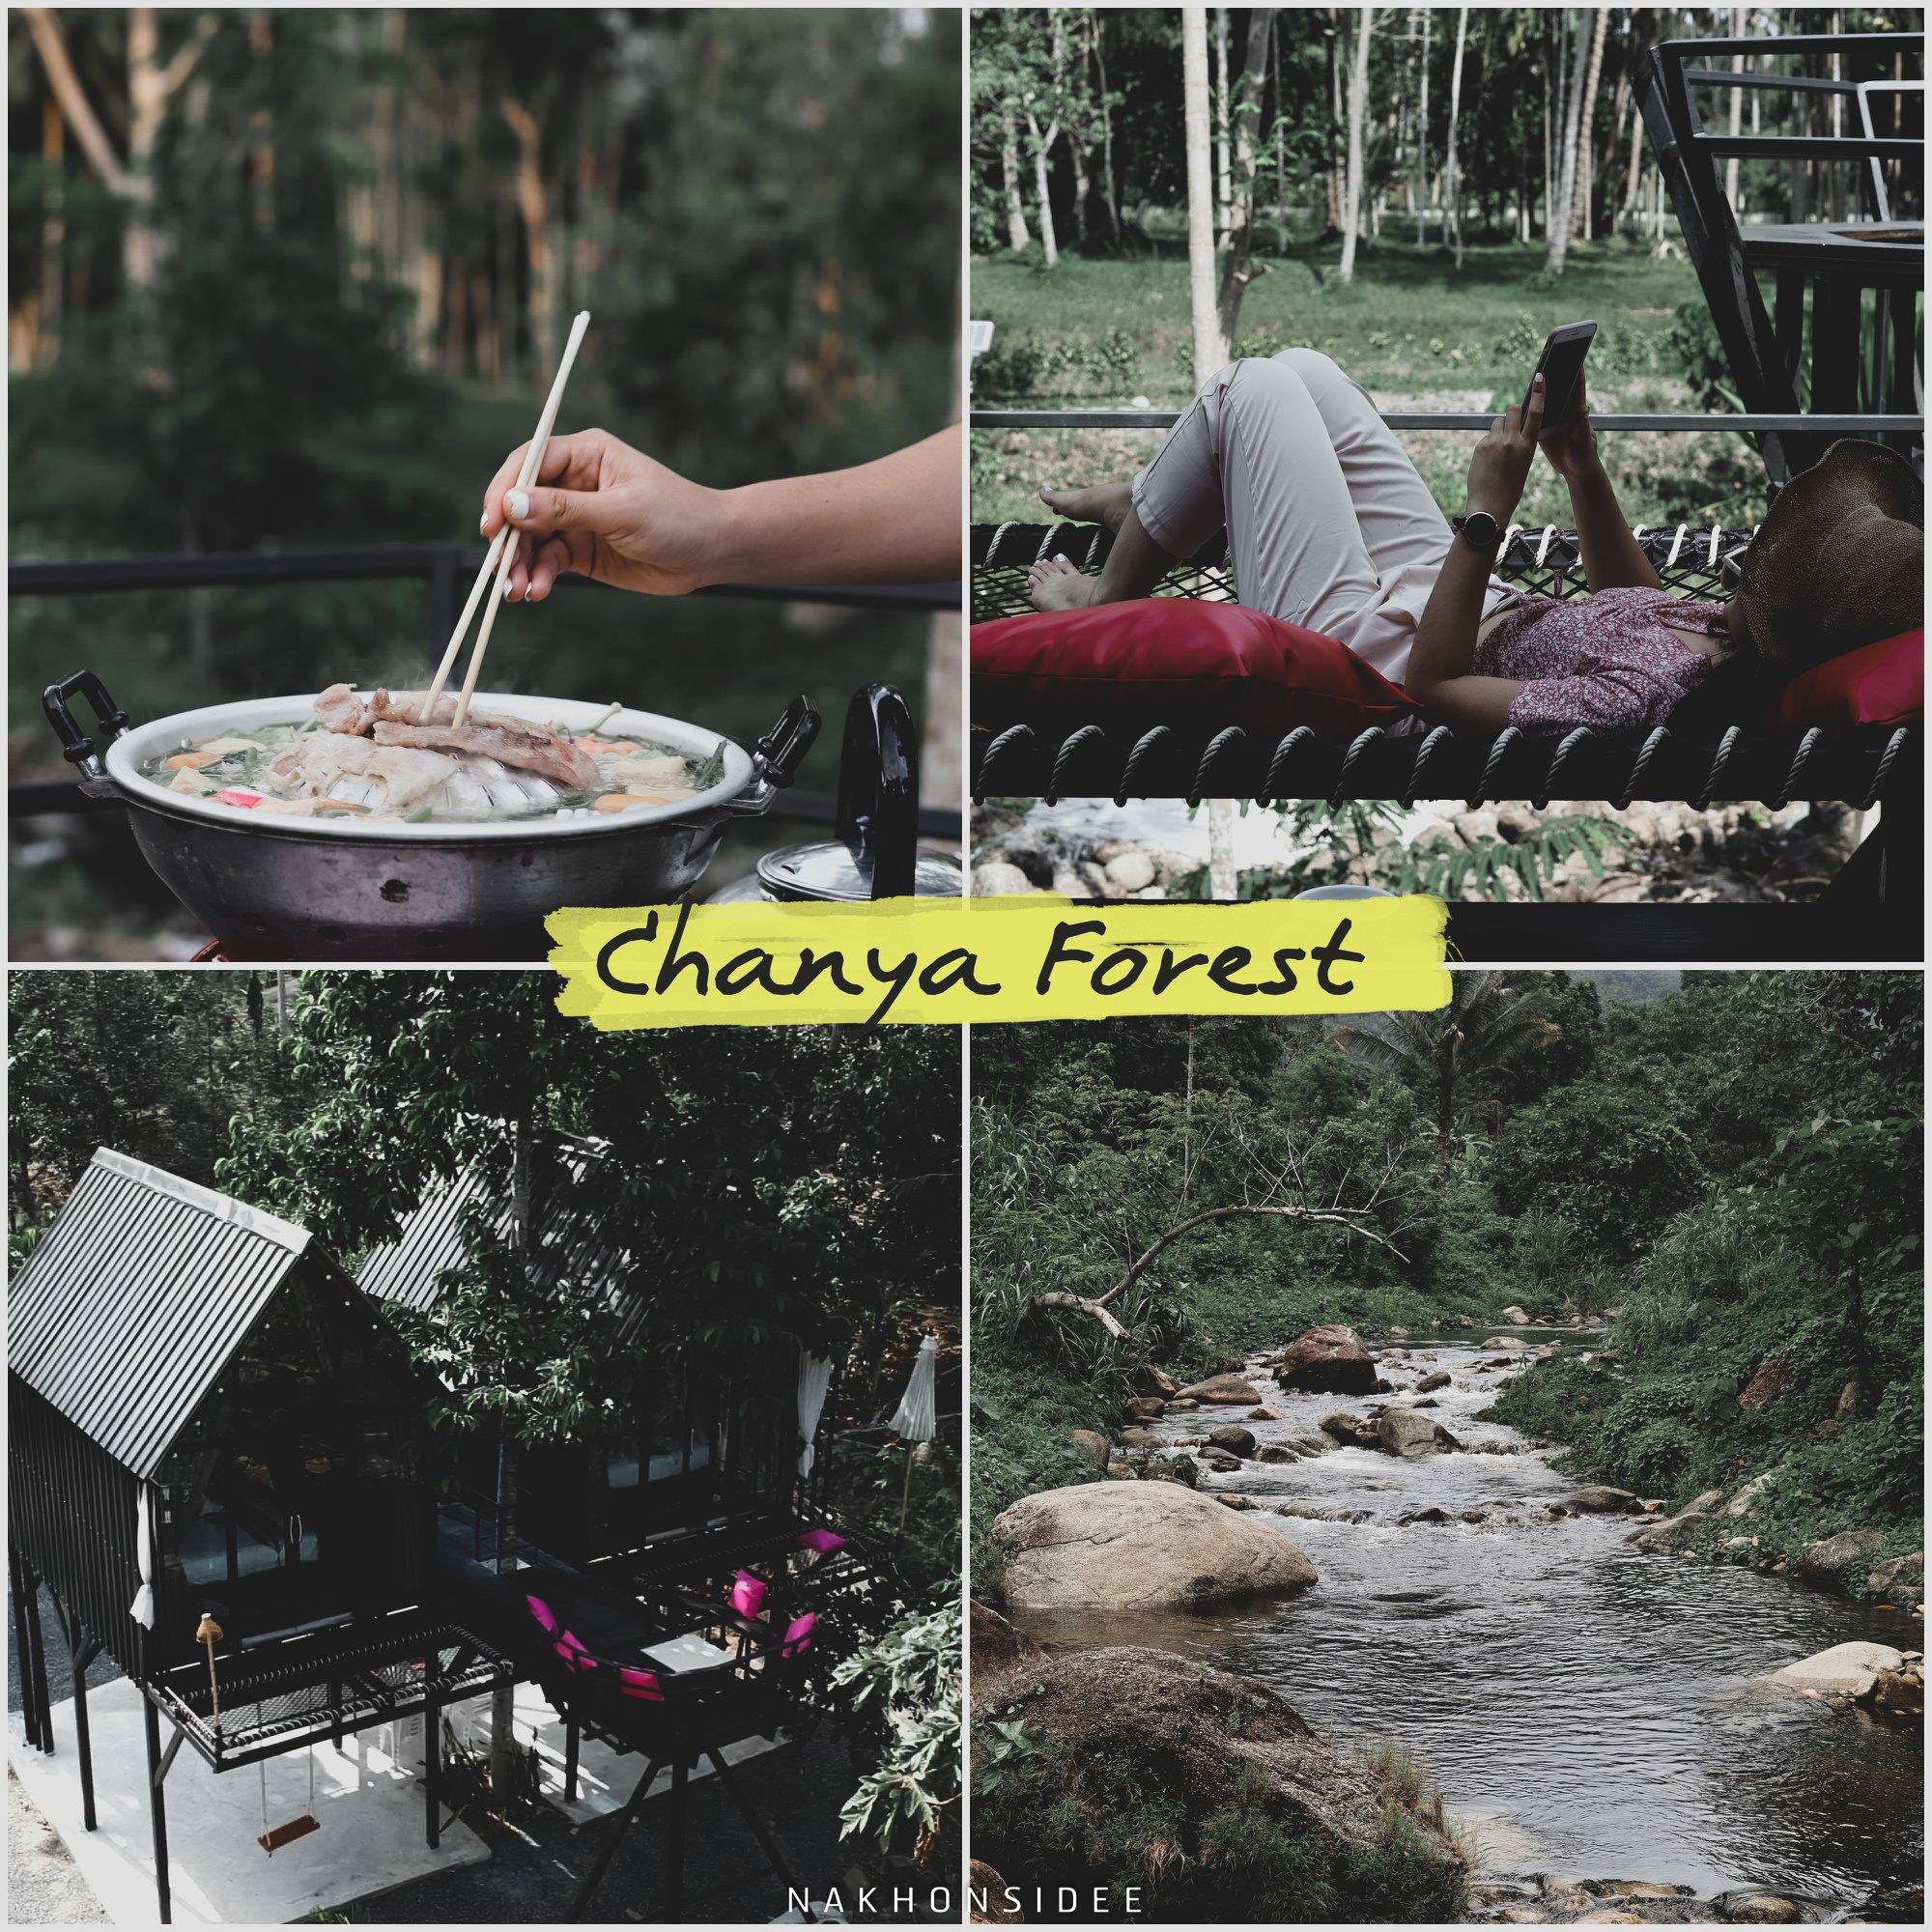 Chanya-Forest-ที่สุดแห่งที่พักริมลำธาร-เพราะอยู่ติดริมลำธารแบบที่สุด-น้ำใสกิ๊งยิ่งกว่าน้ำตกอีกกก-ปิ้งย่างน้ำจิ้มหร่อยมวากก-10/10 คลิกที่นี่ ช้างกลาง,นครศรีธรรมราช,วิวหลักล้าน,กลางป่า